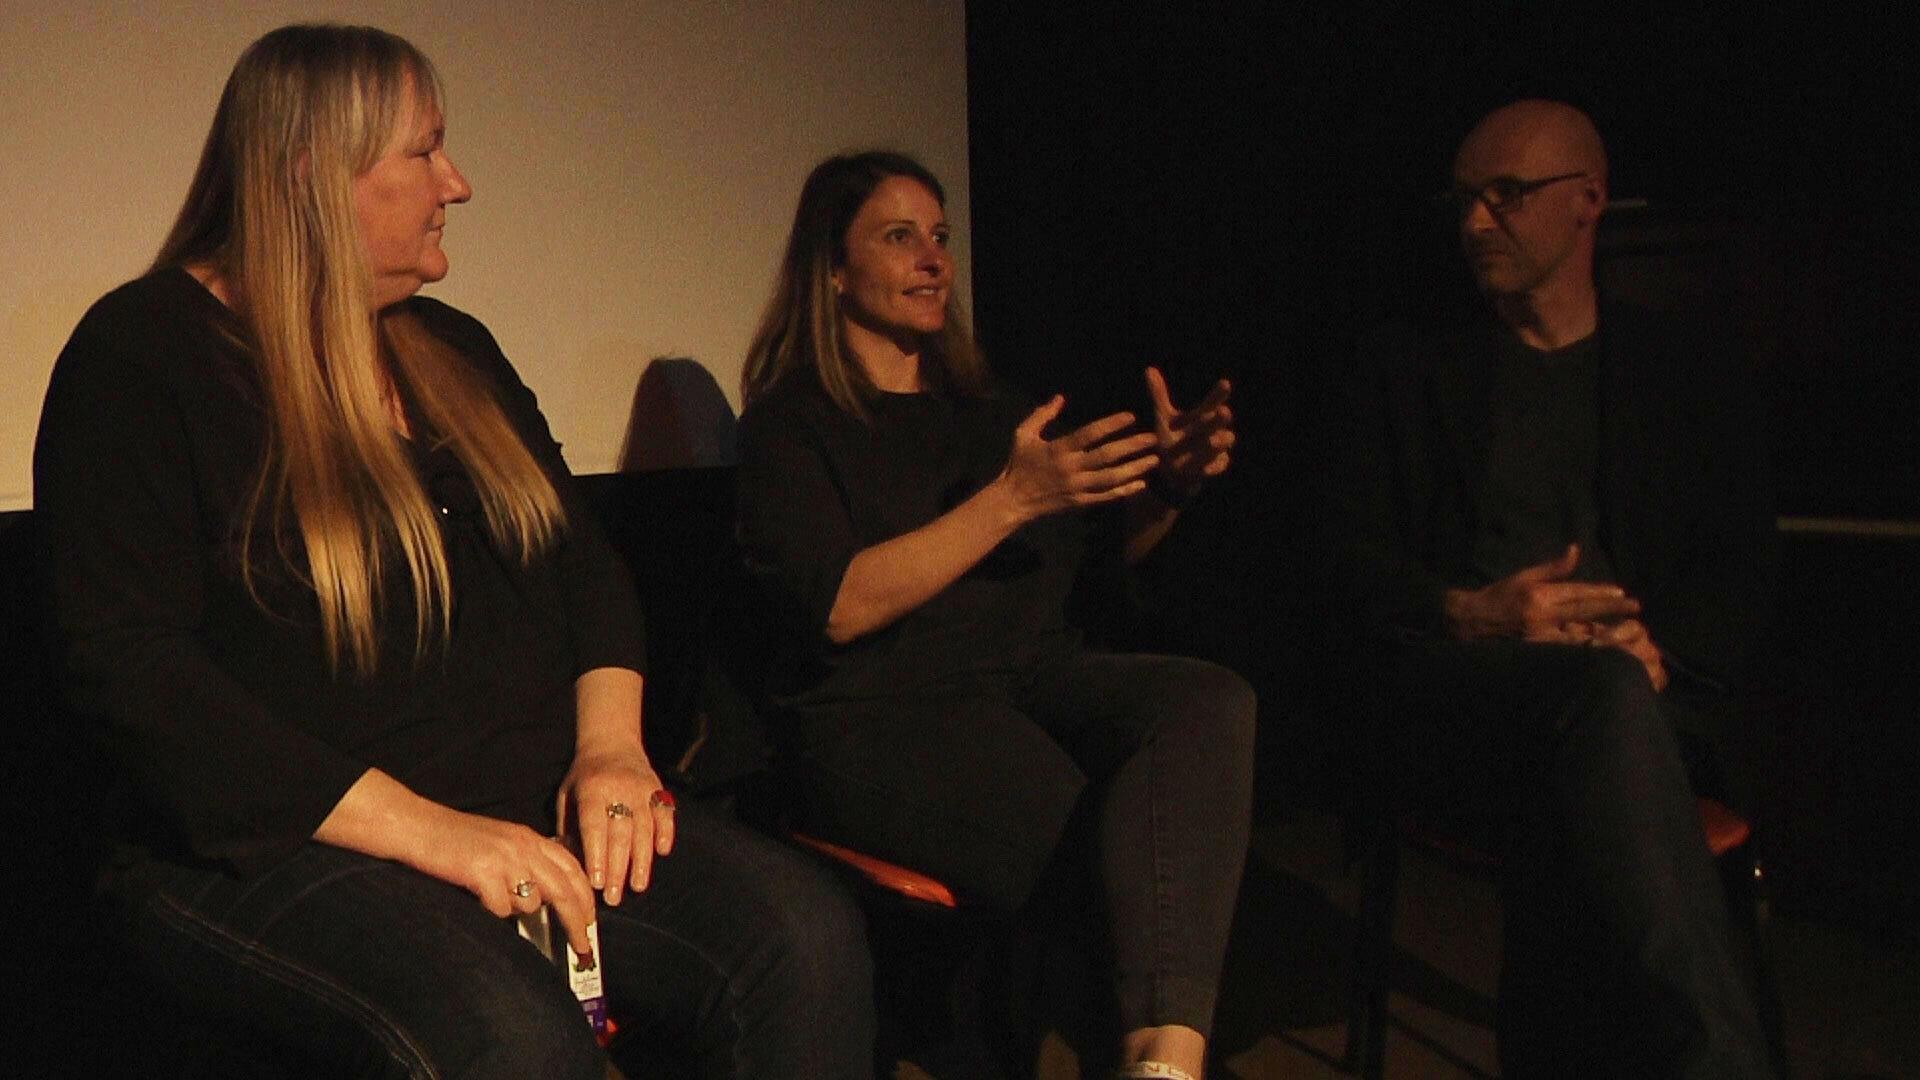 Marie Craven, Maria Vella, and Brendan Bonsack Poetry + Video screening in Melbourne 21 October 2019.